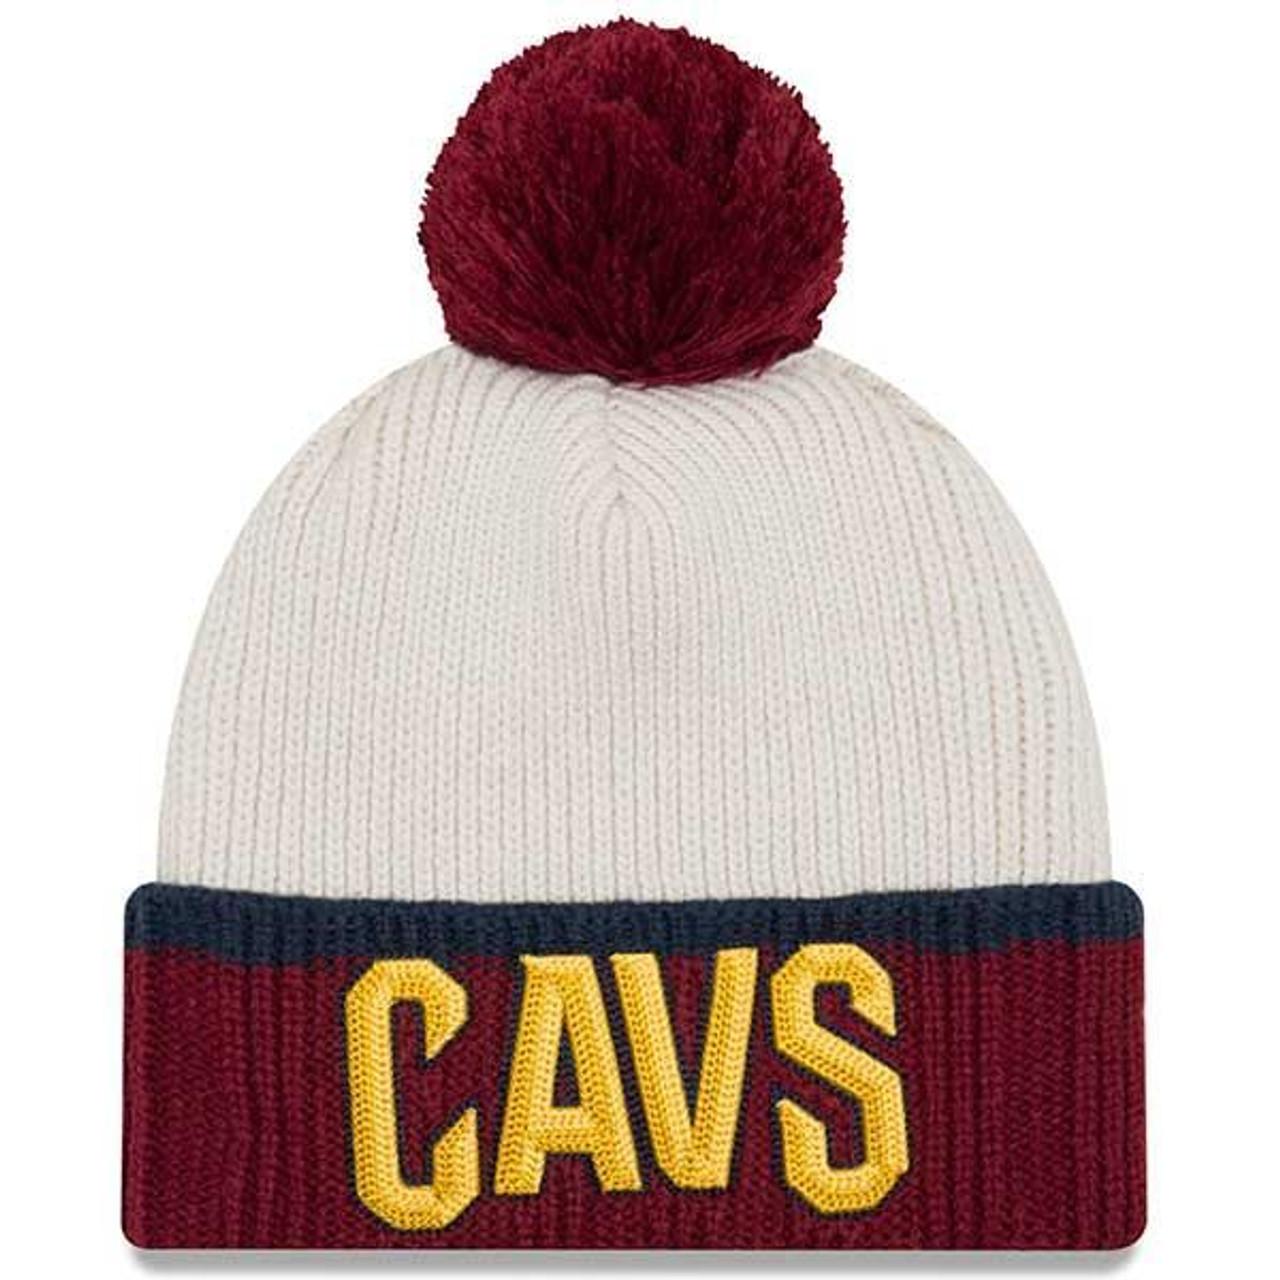 Prime Pom Knit Hat - Cleveland Cavaliers f57b2e0d9eb